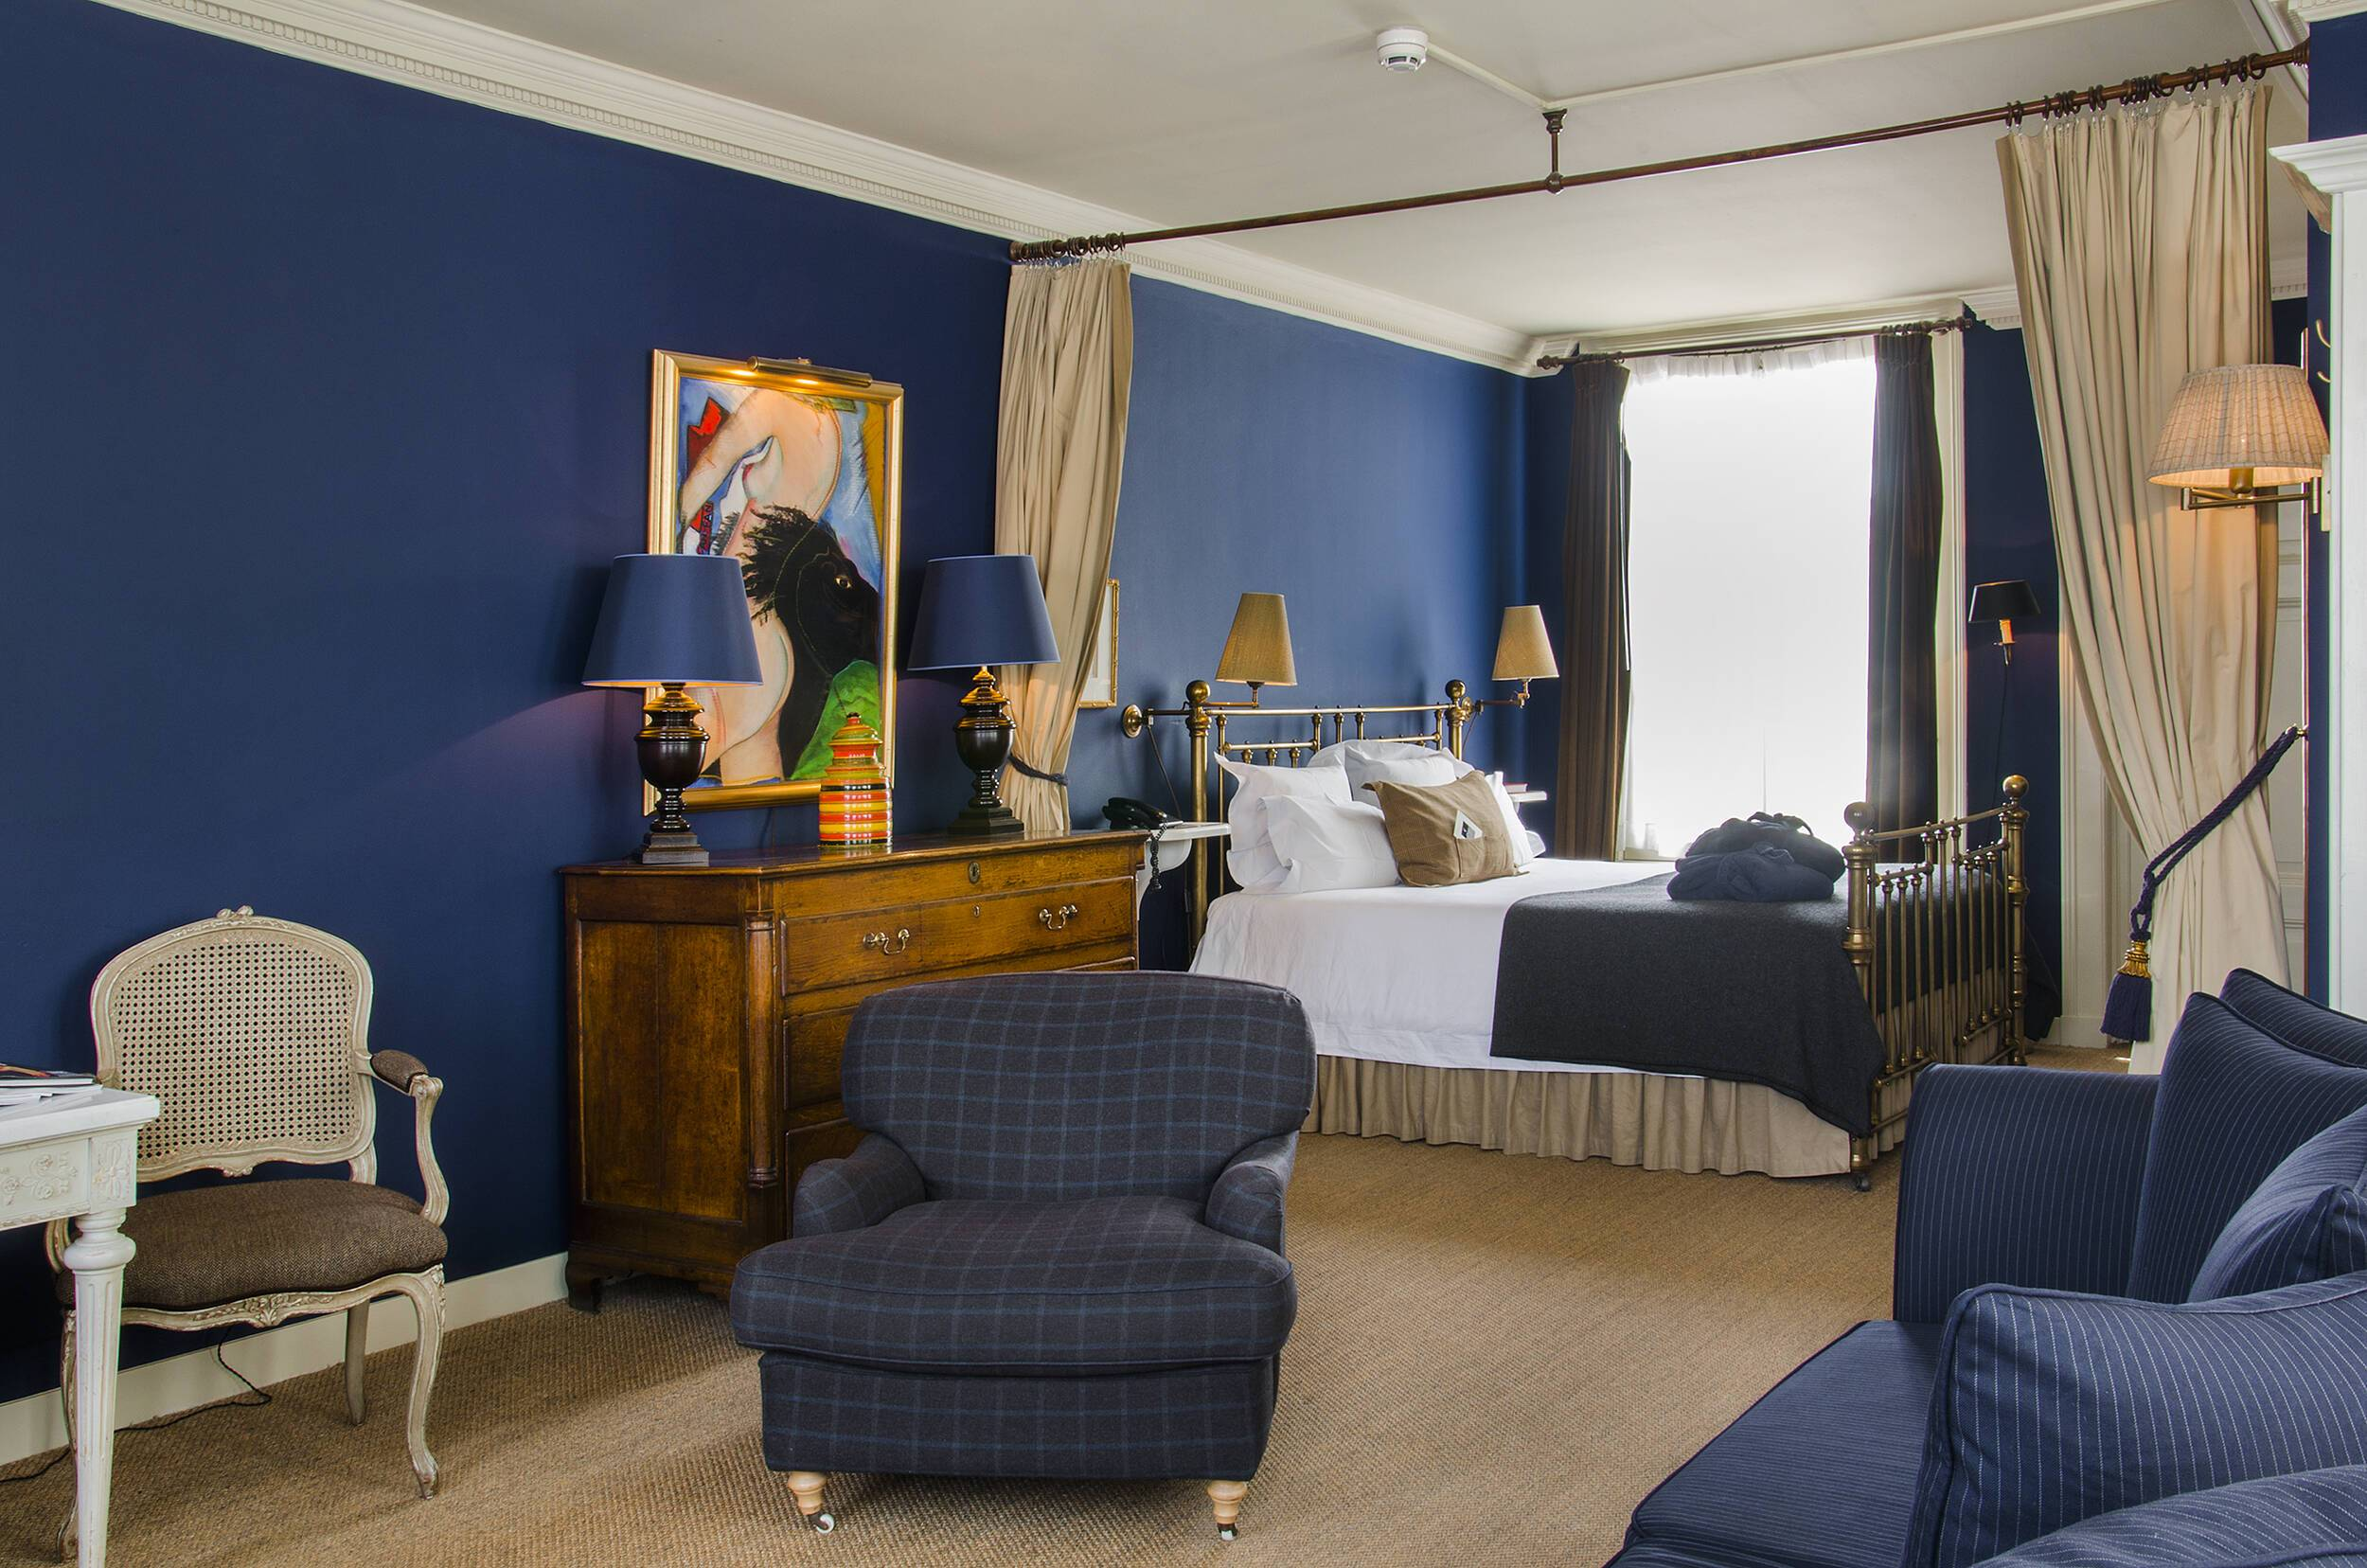 717 hotel junior suite von goethe amsterdam